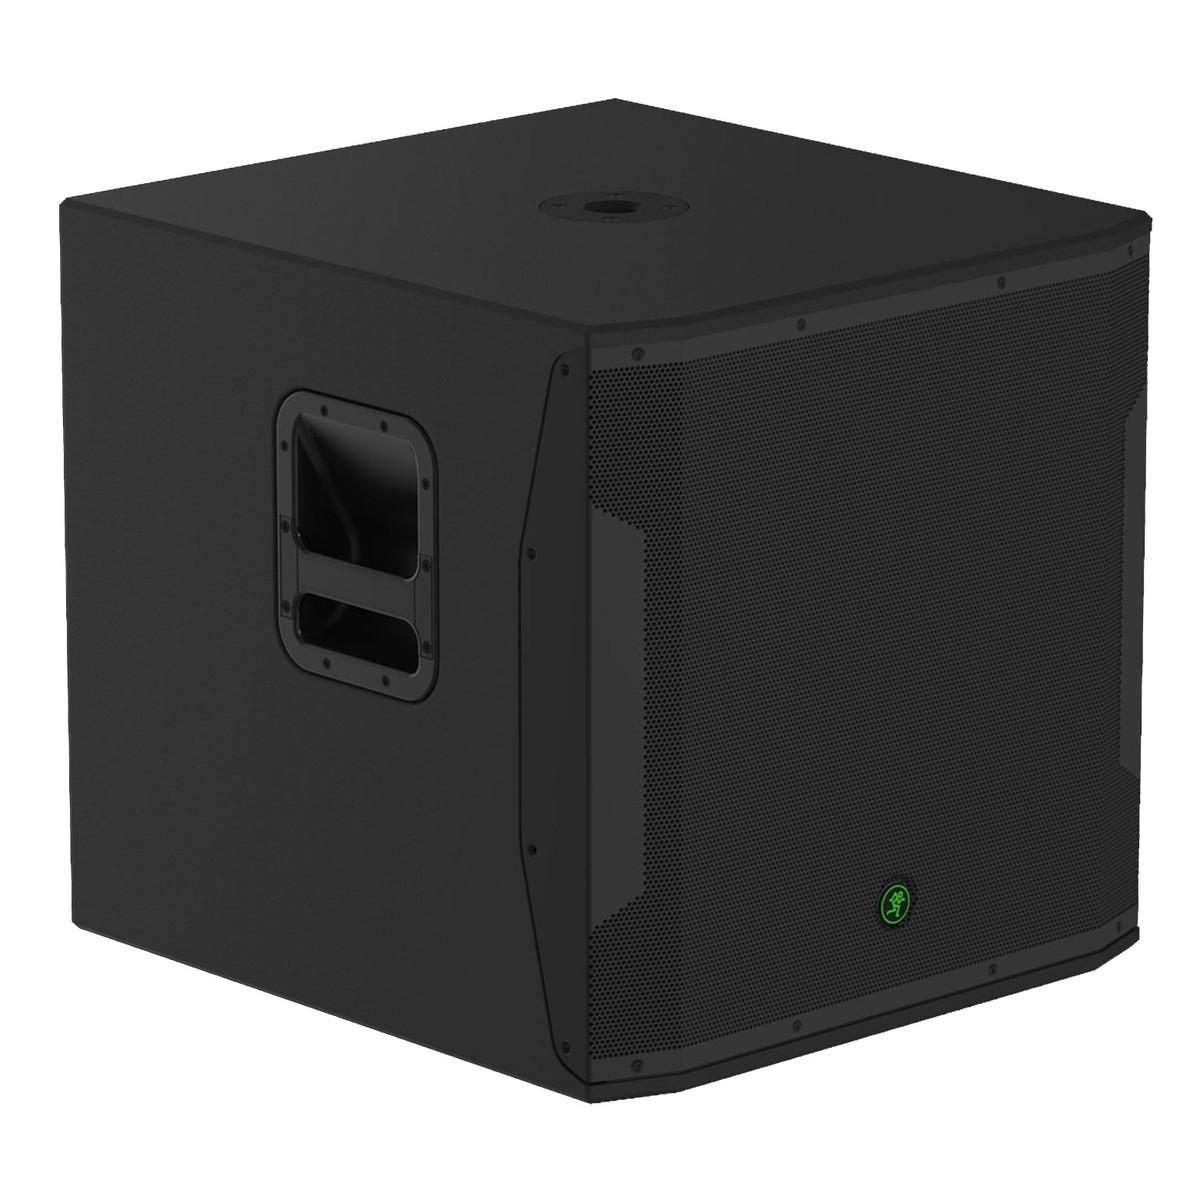 Mackie SRM1850 18 Inch Active Subwoofer Speaker - Box Opened